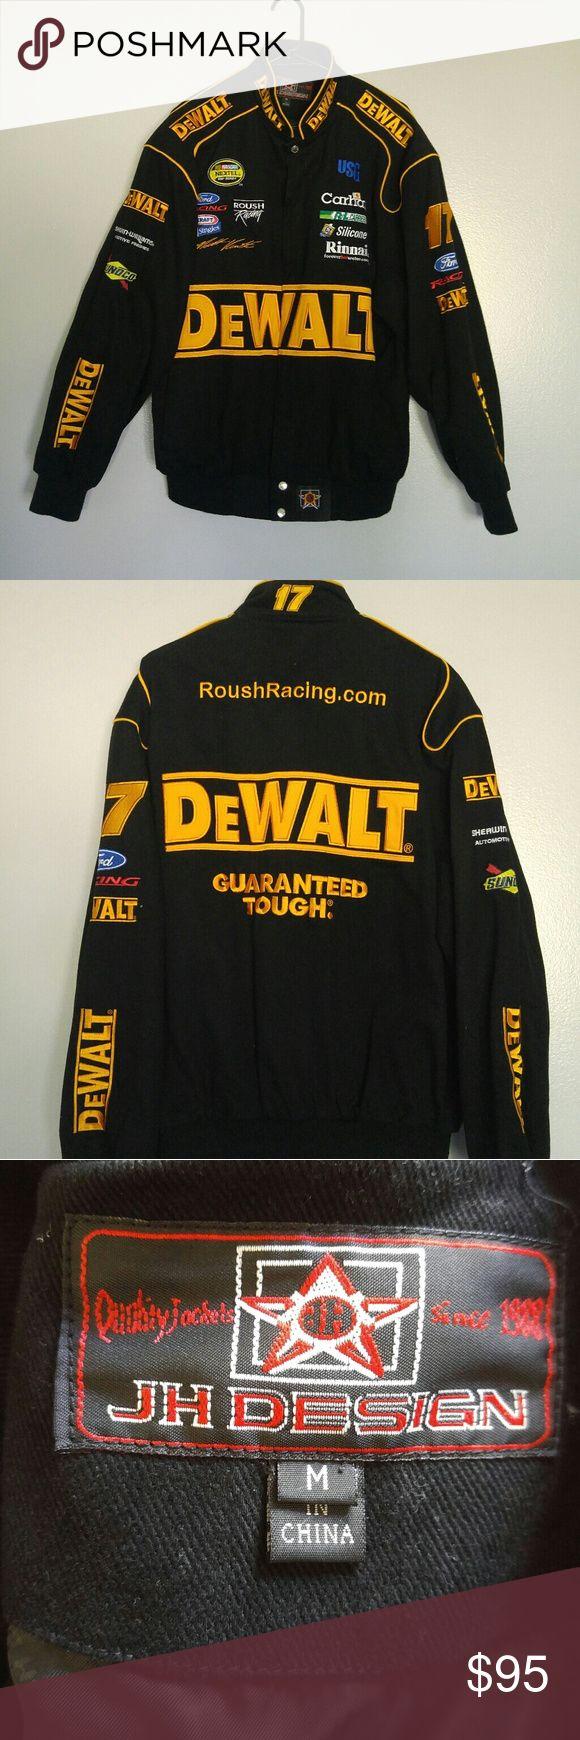 Nascar DeWalt Jacket Never worn Nascar jacket. In great condition. Jackets & Coats Performance Jackets